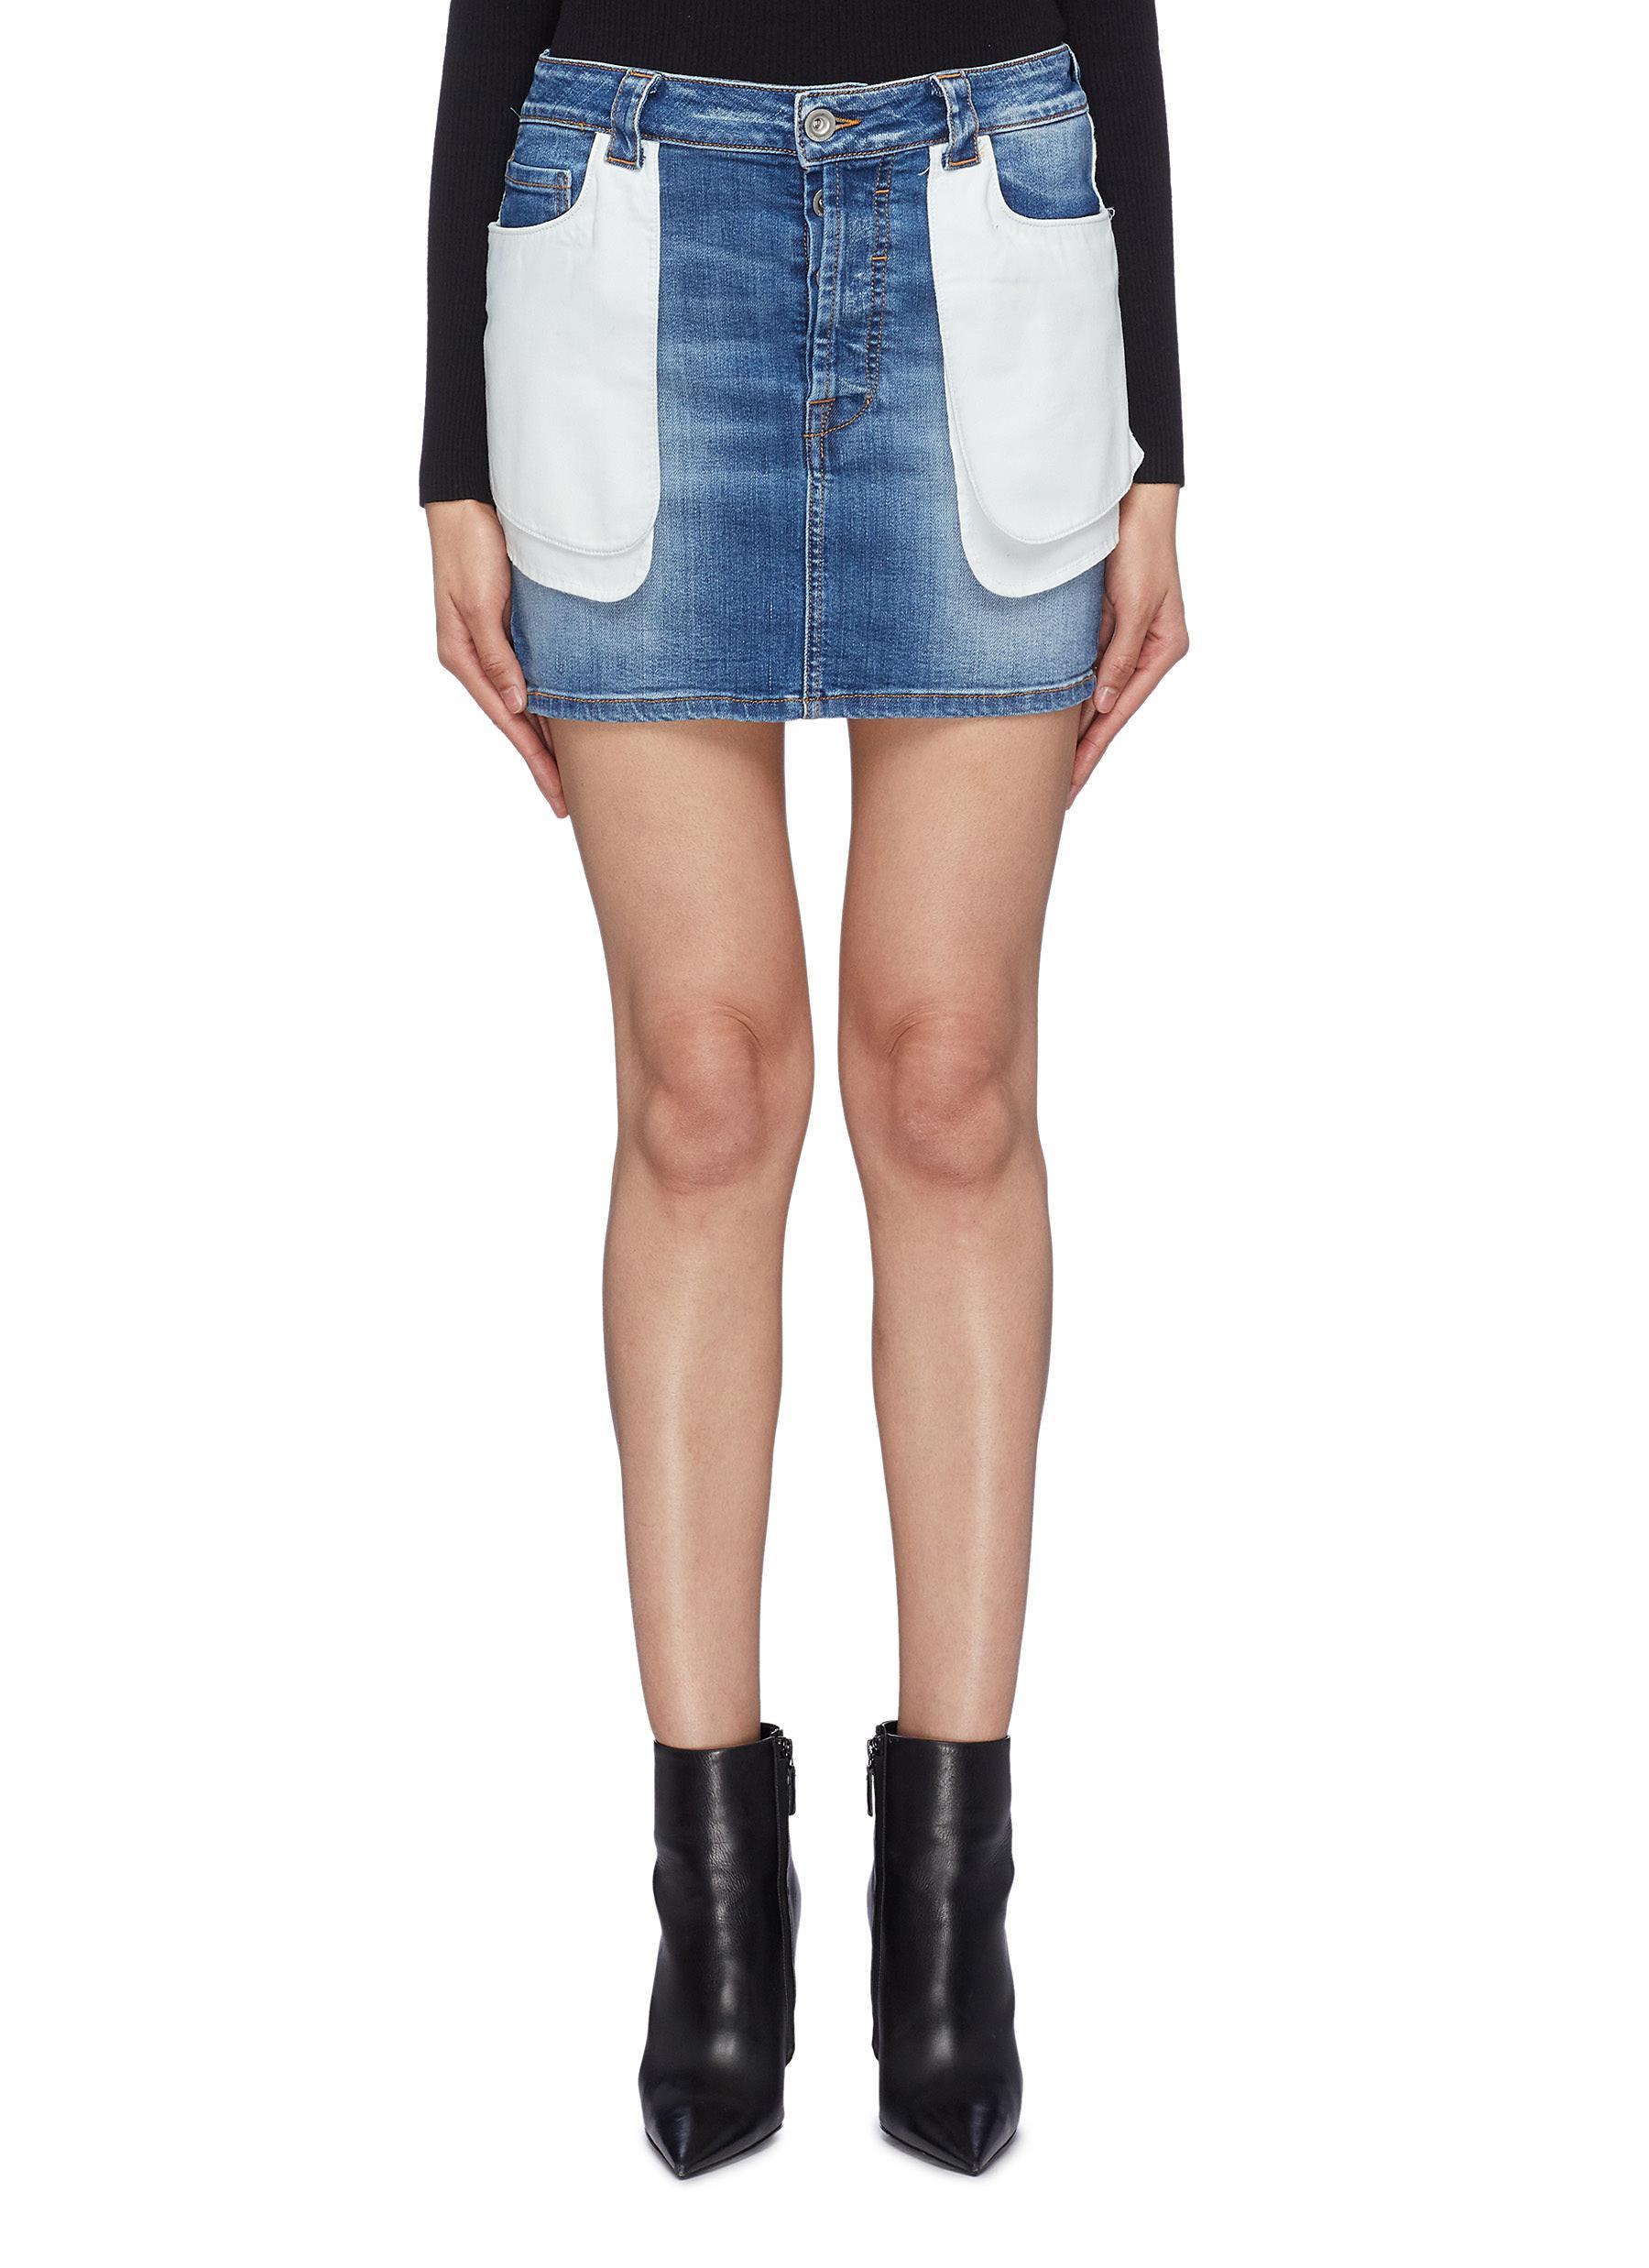 339485ac1dbd Ben Taverniti Unravel Project. Contrast layered pocket panel washed denim  skirt